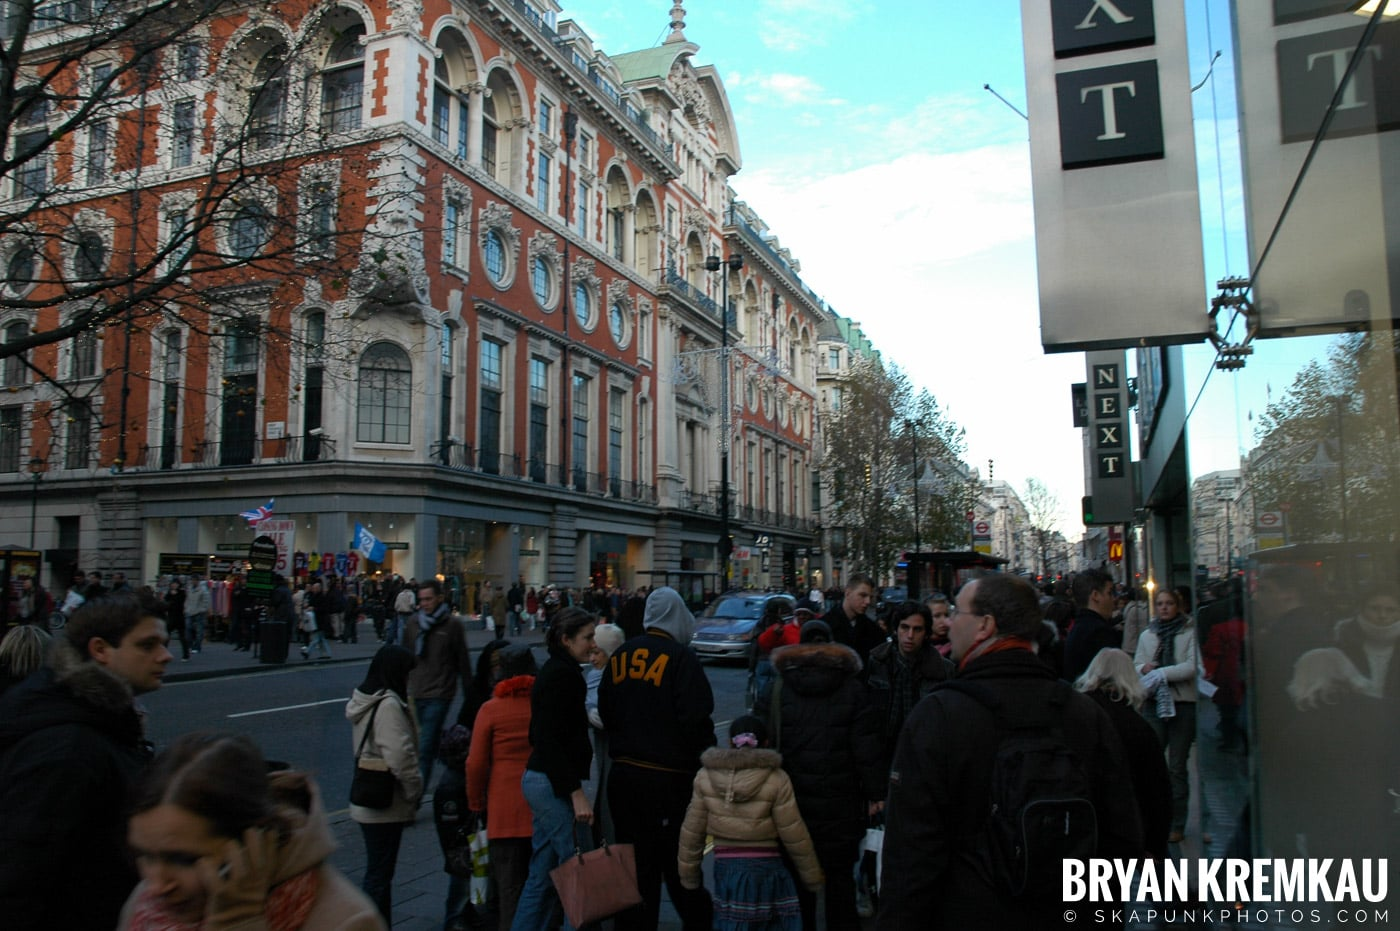 London, England - Day 3 - 12.18.05 (24)